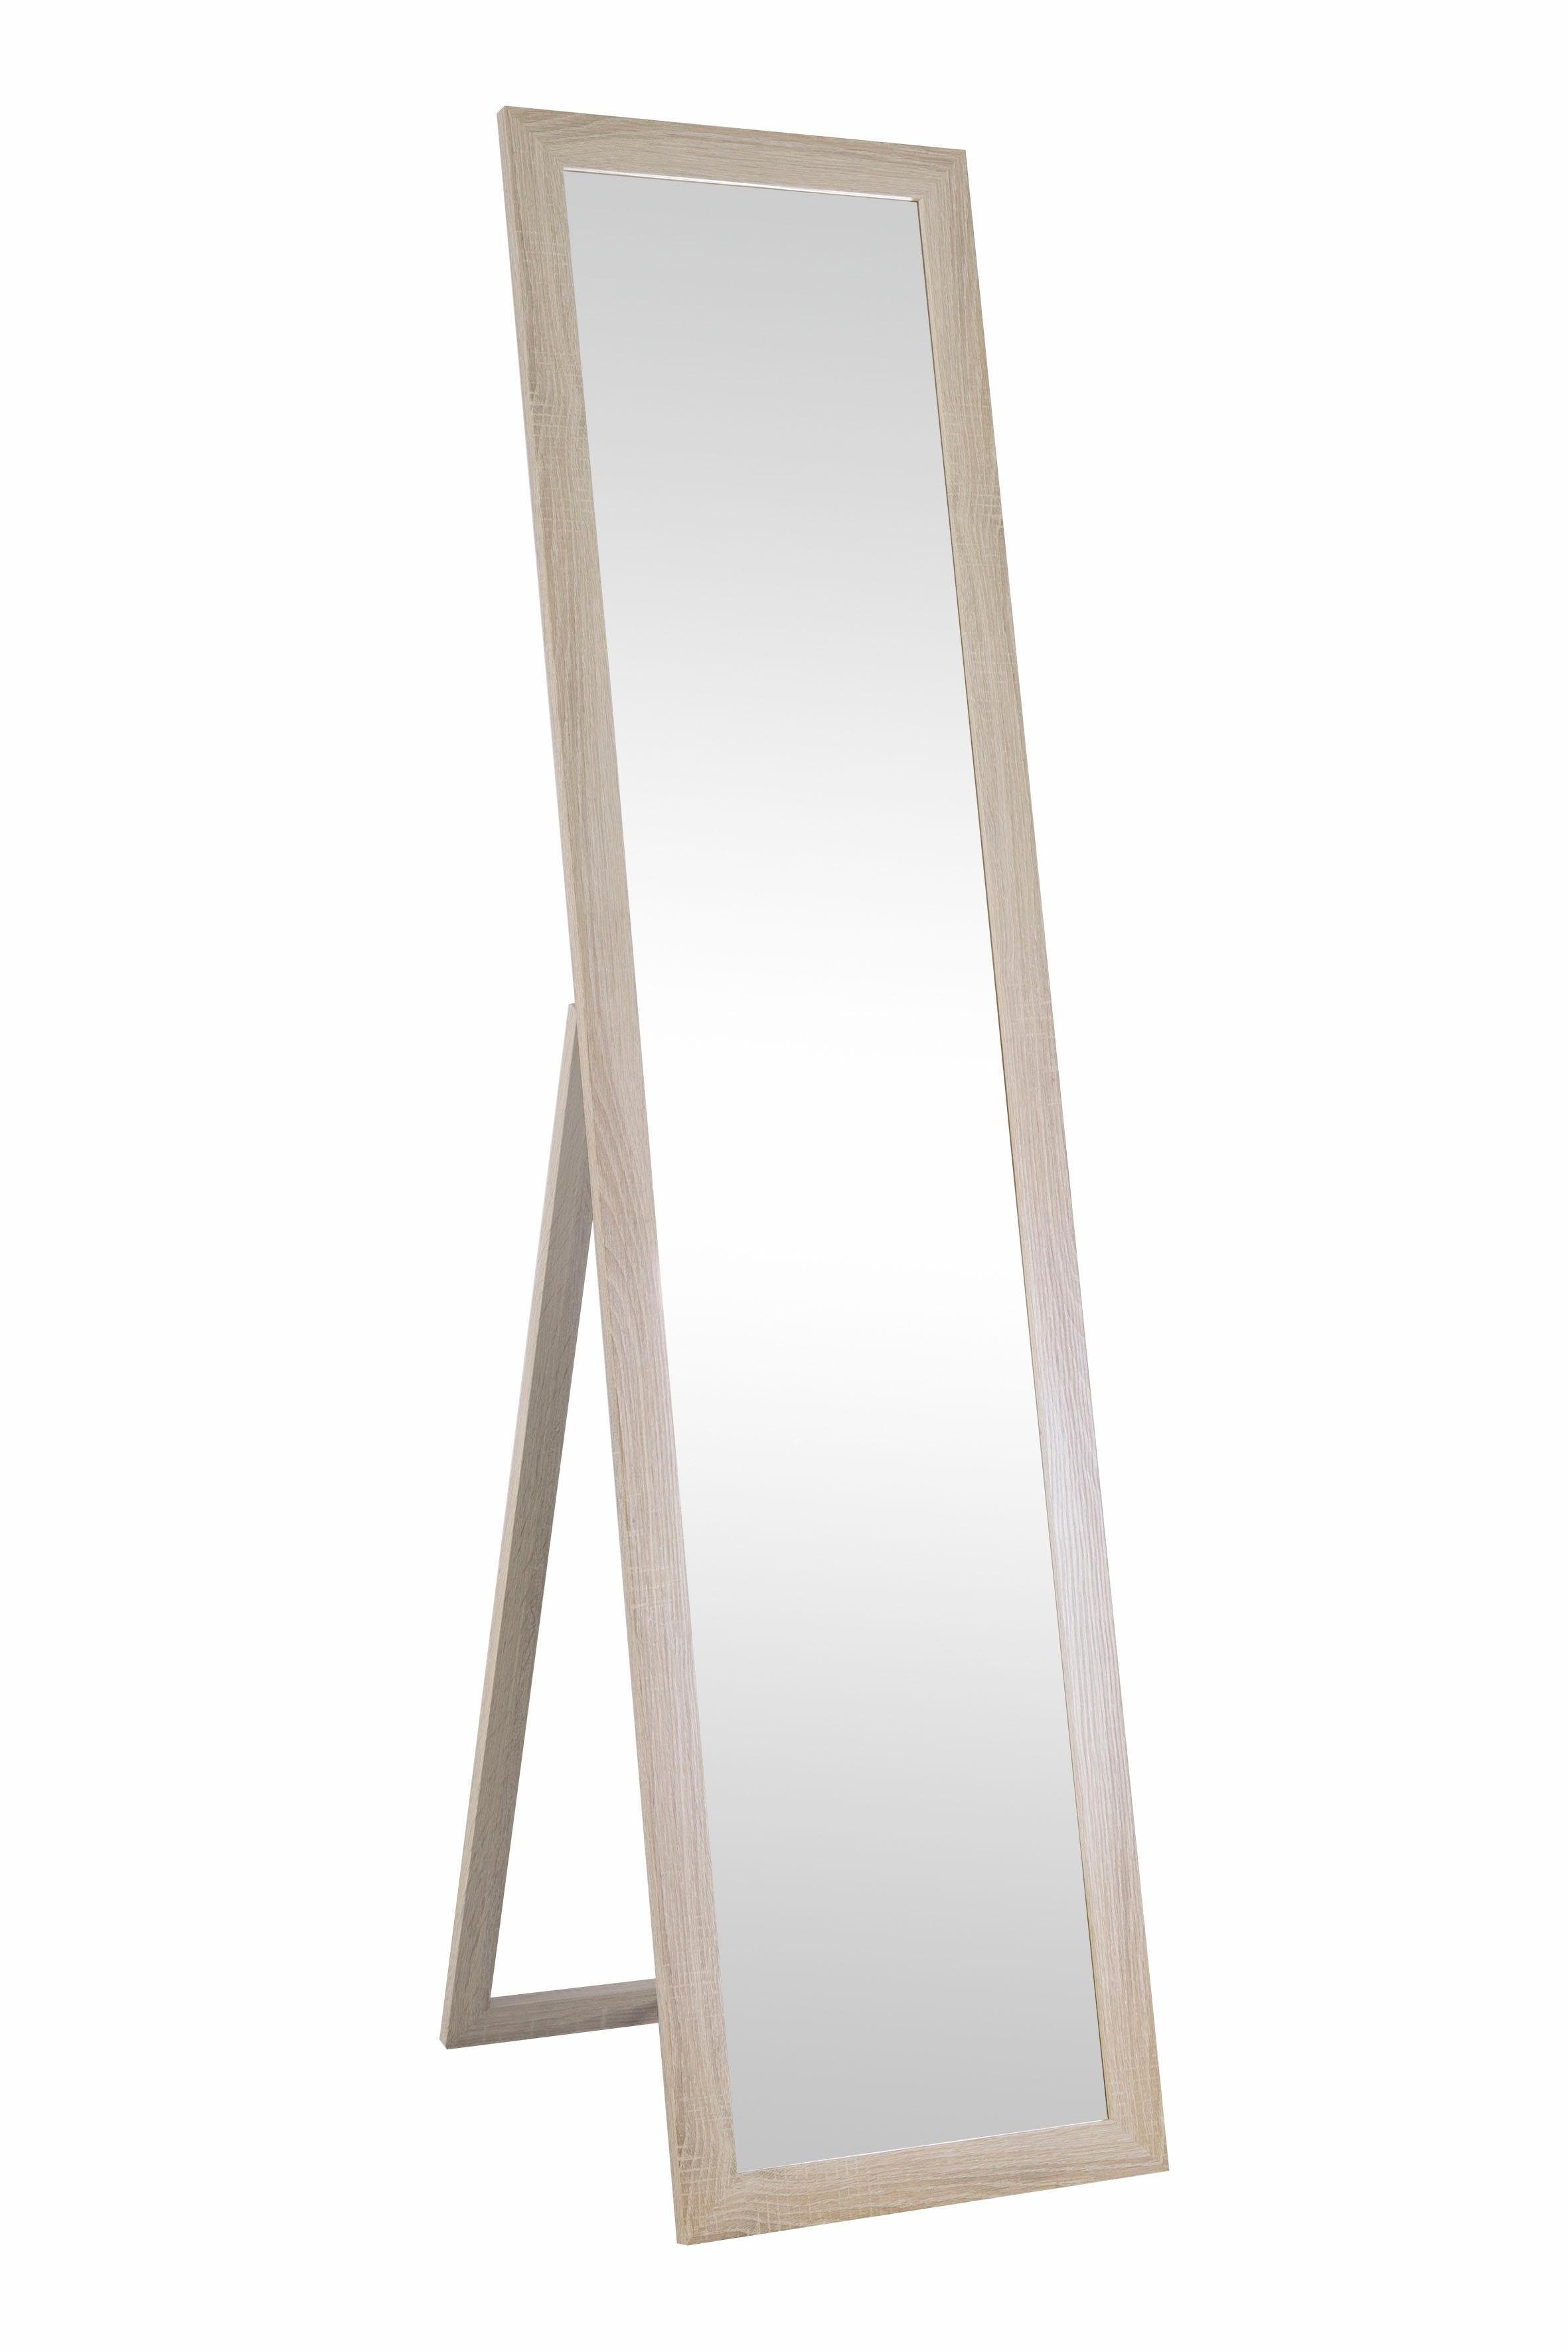 INOSIGN Spiegel, »Emilia«, 40/160 cm